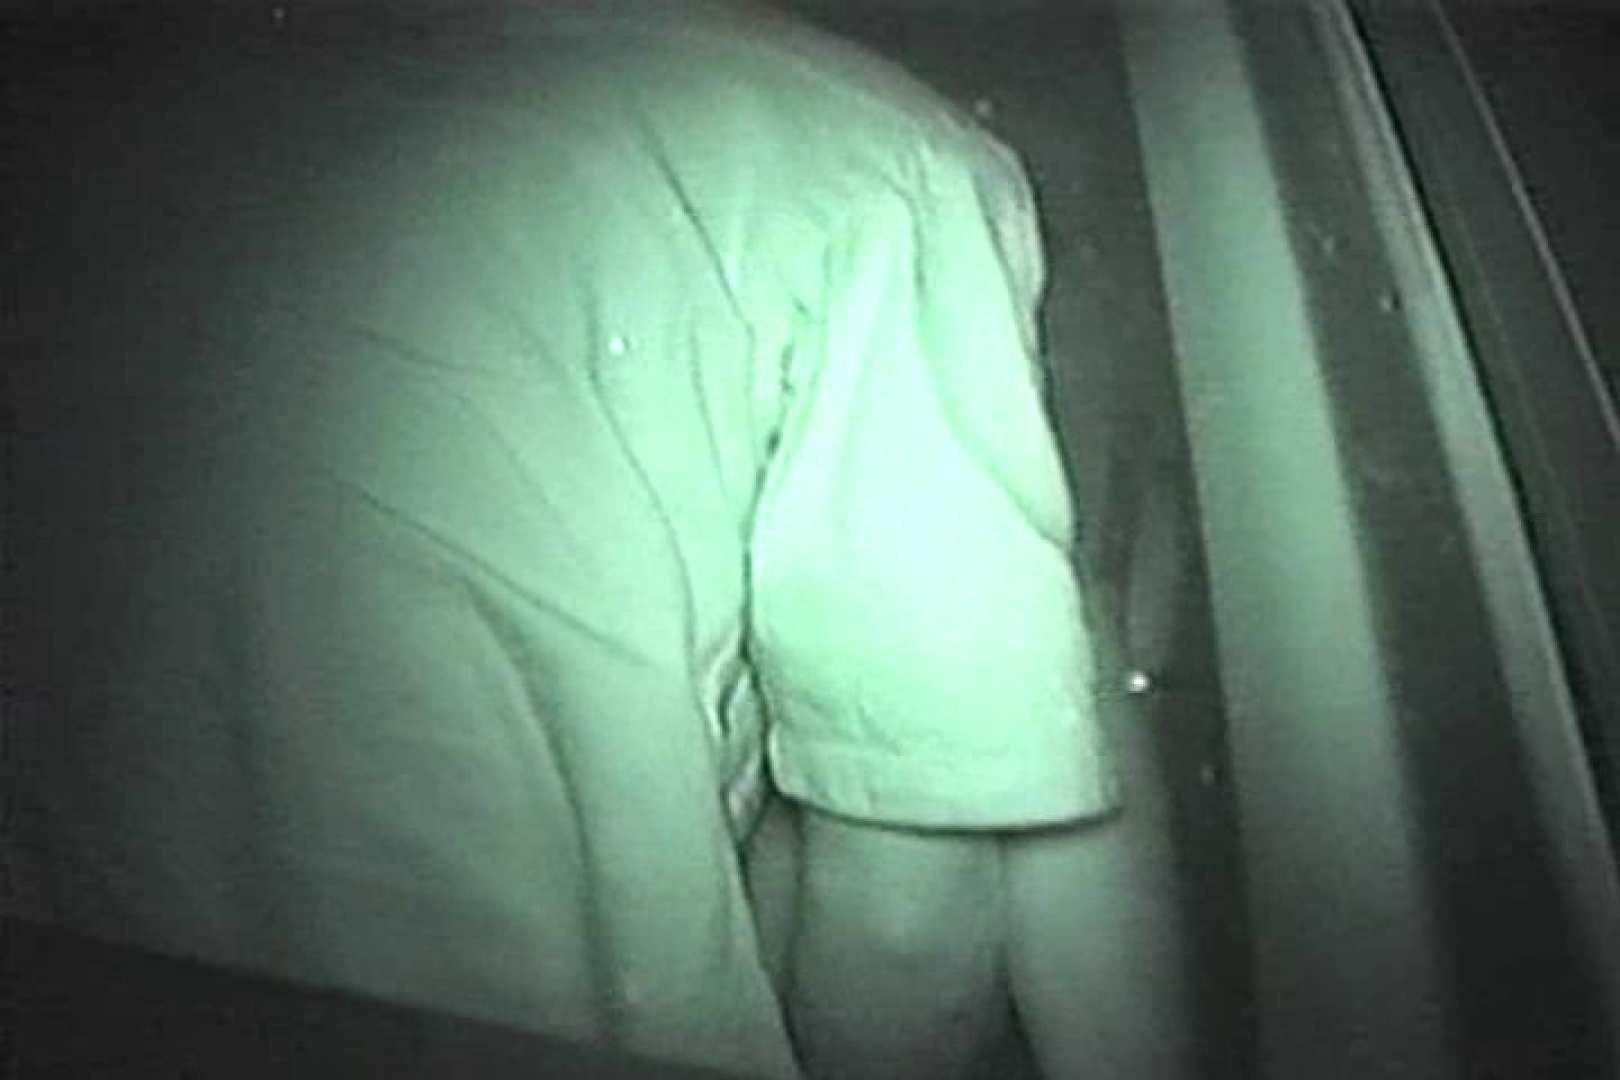 MASAさんの待ち伏せ撮り! 赤外線カーセックスVol.3 カーセックス 盗み撮り動画キャプチャ 71pic 39